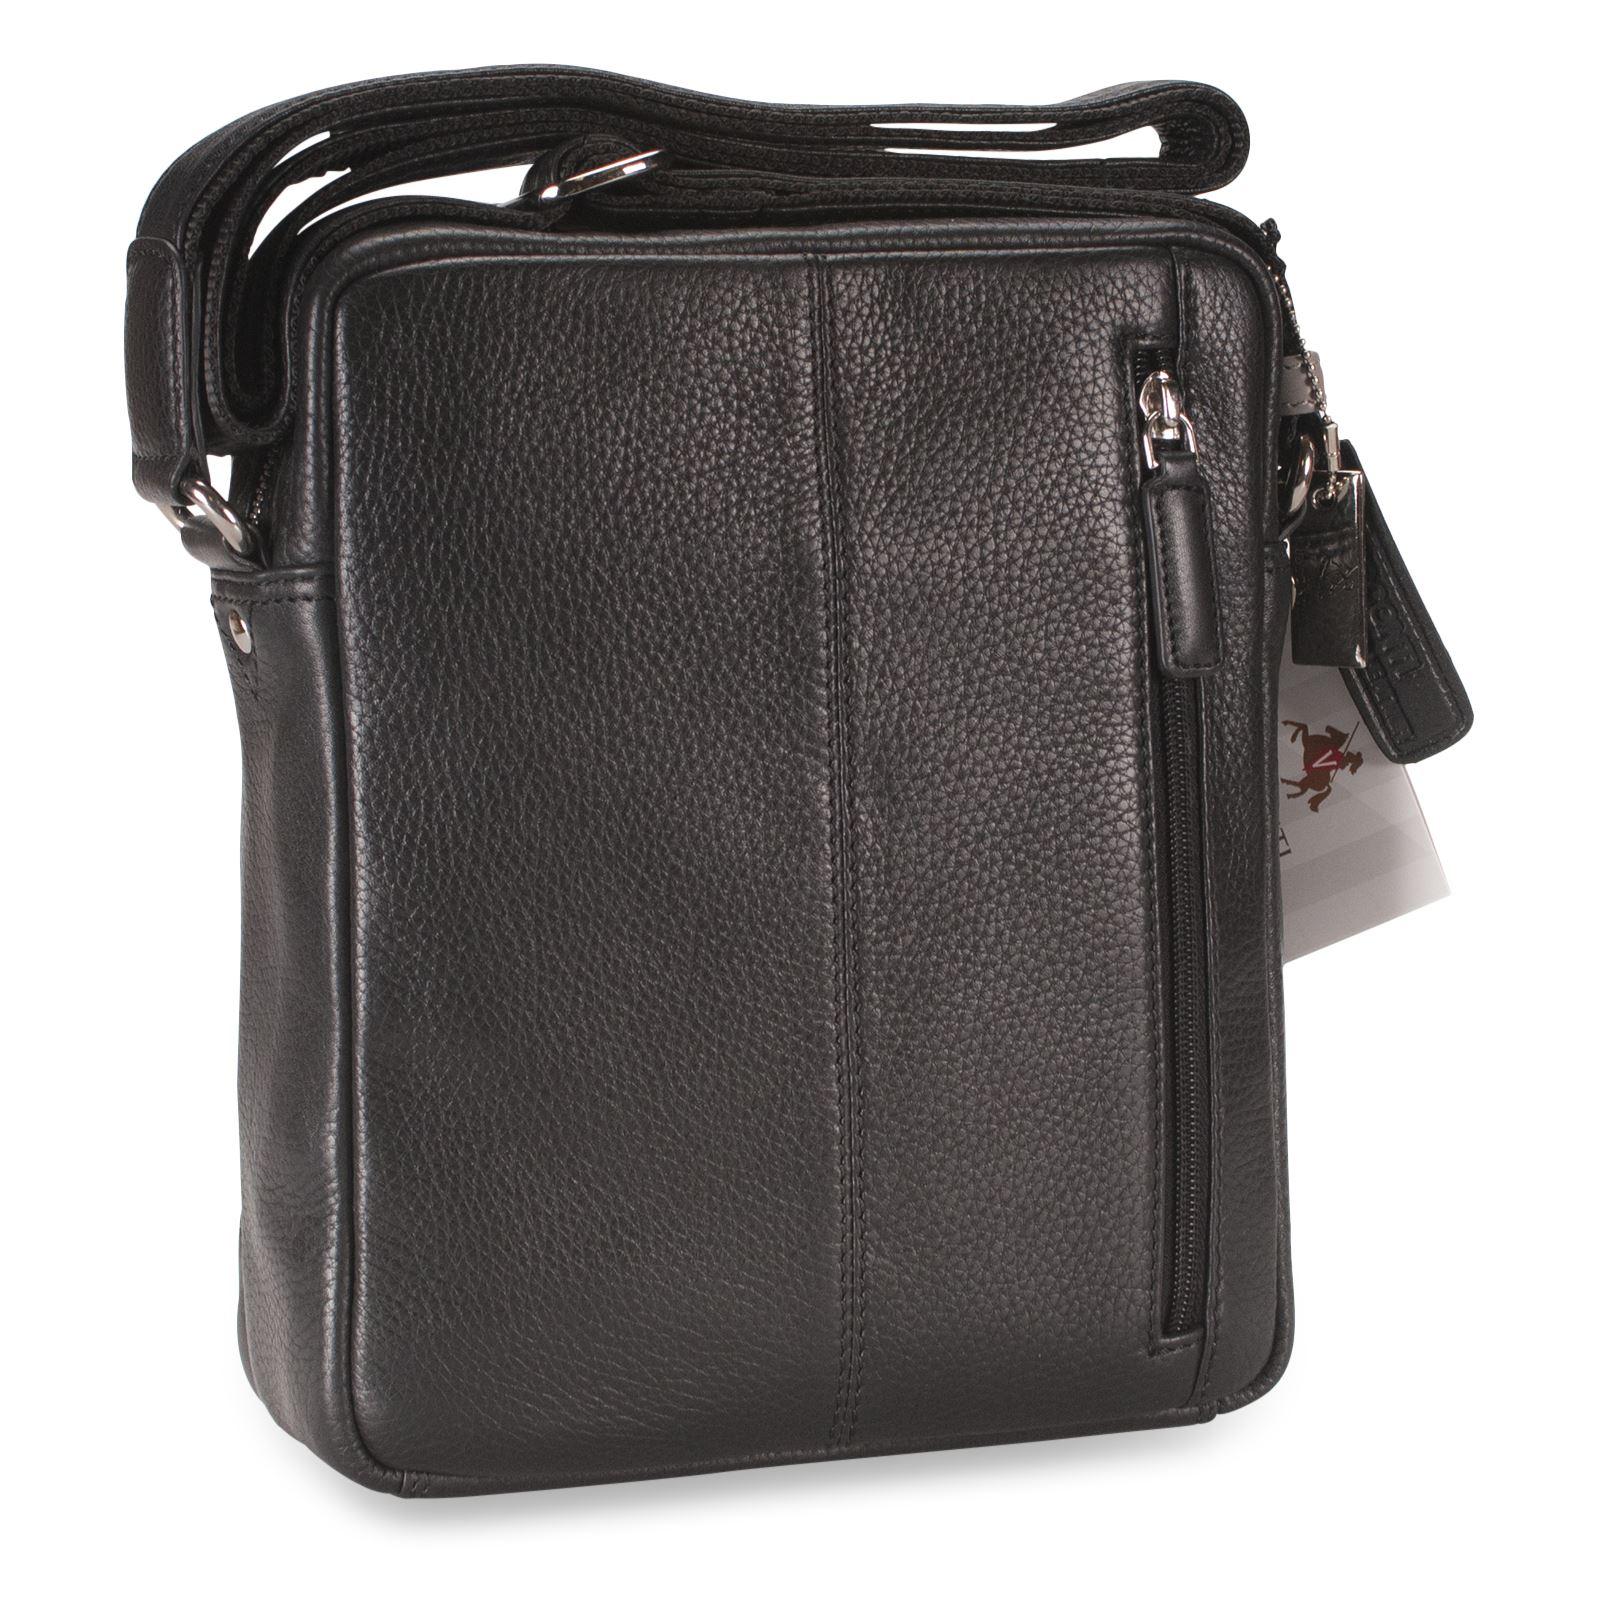 Ipad Shoulder Bag Ebay 90